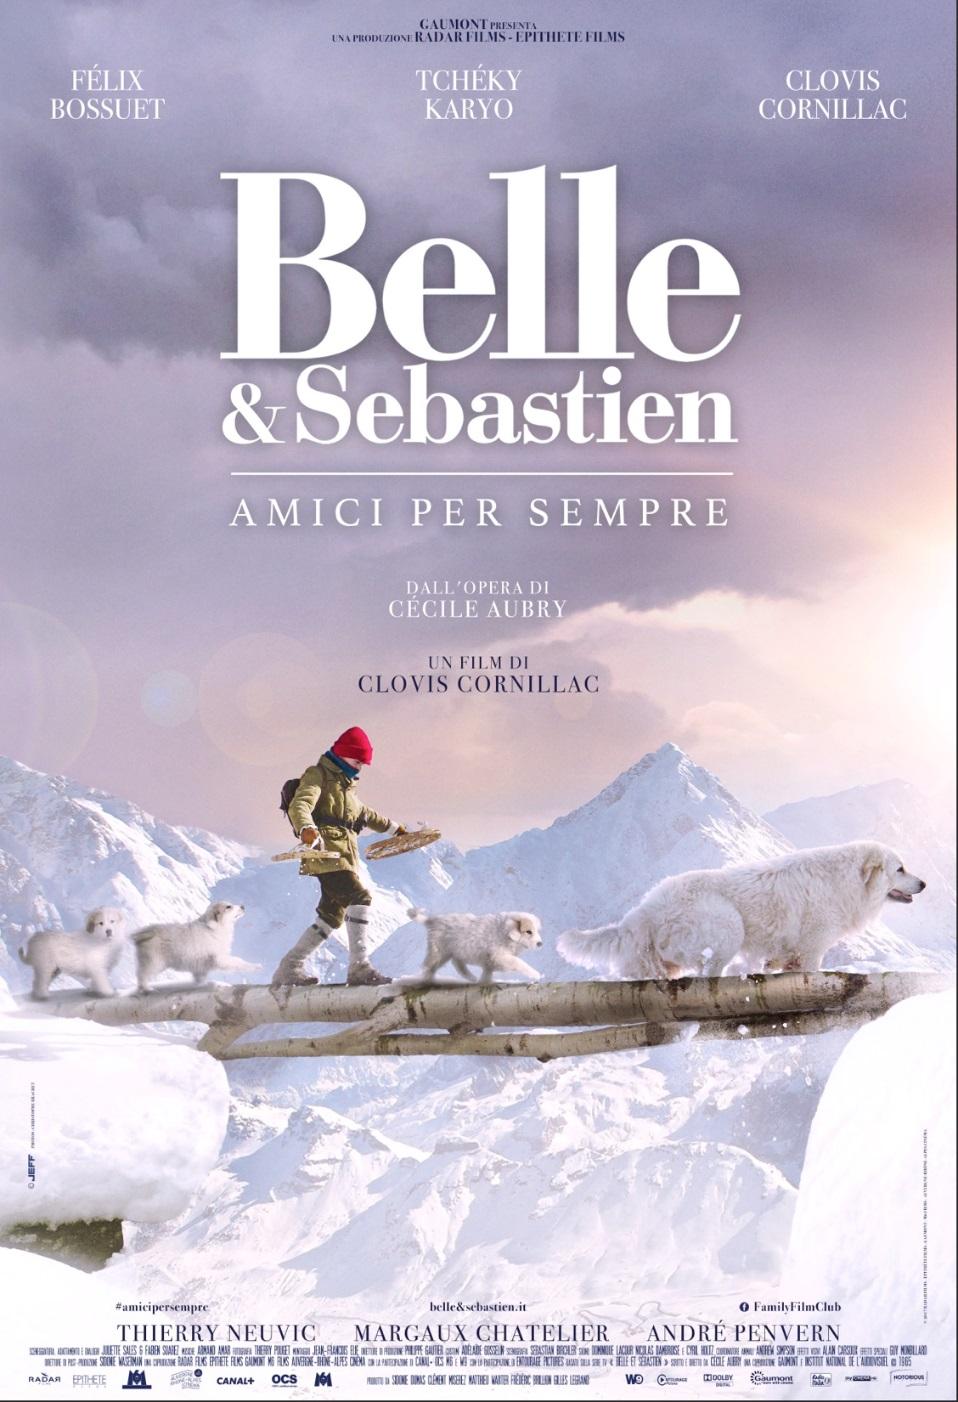 BELLE & SEBASTIEN - AMICI PER SEMPRE (DVD)